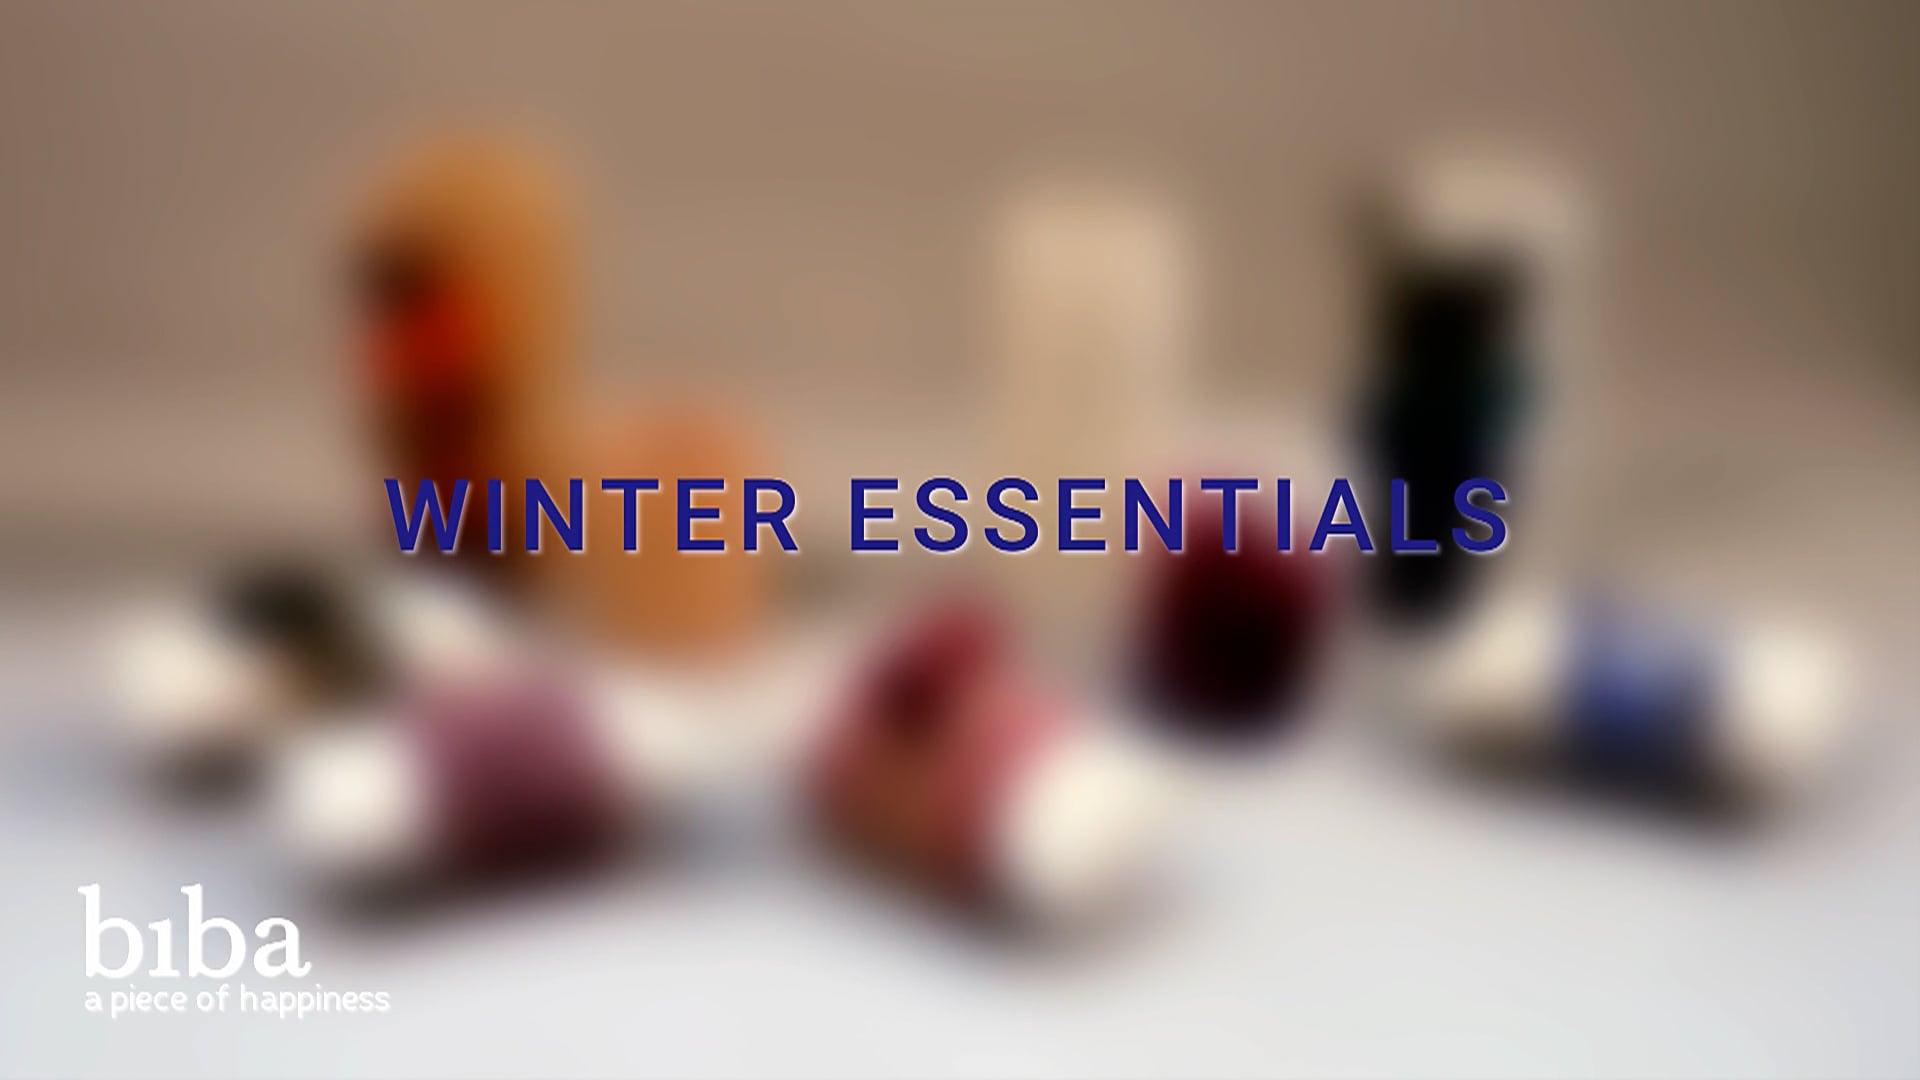 Biba Winter Essentials AW21